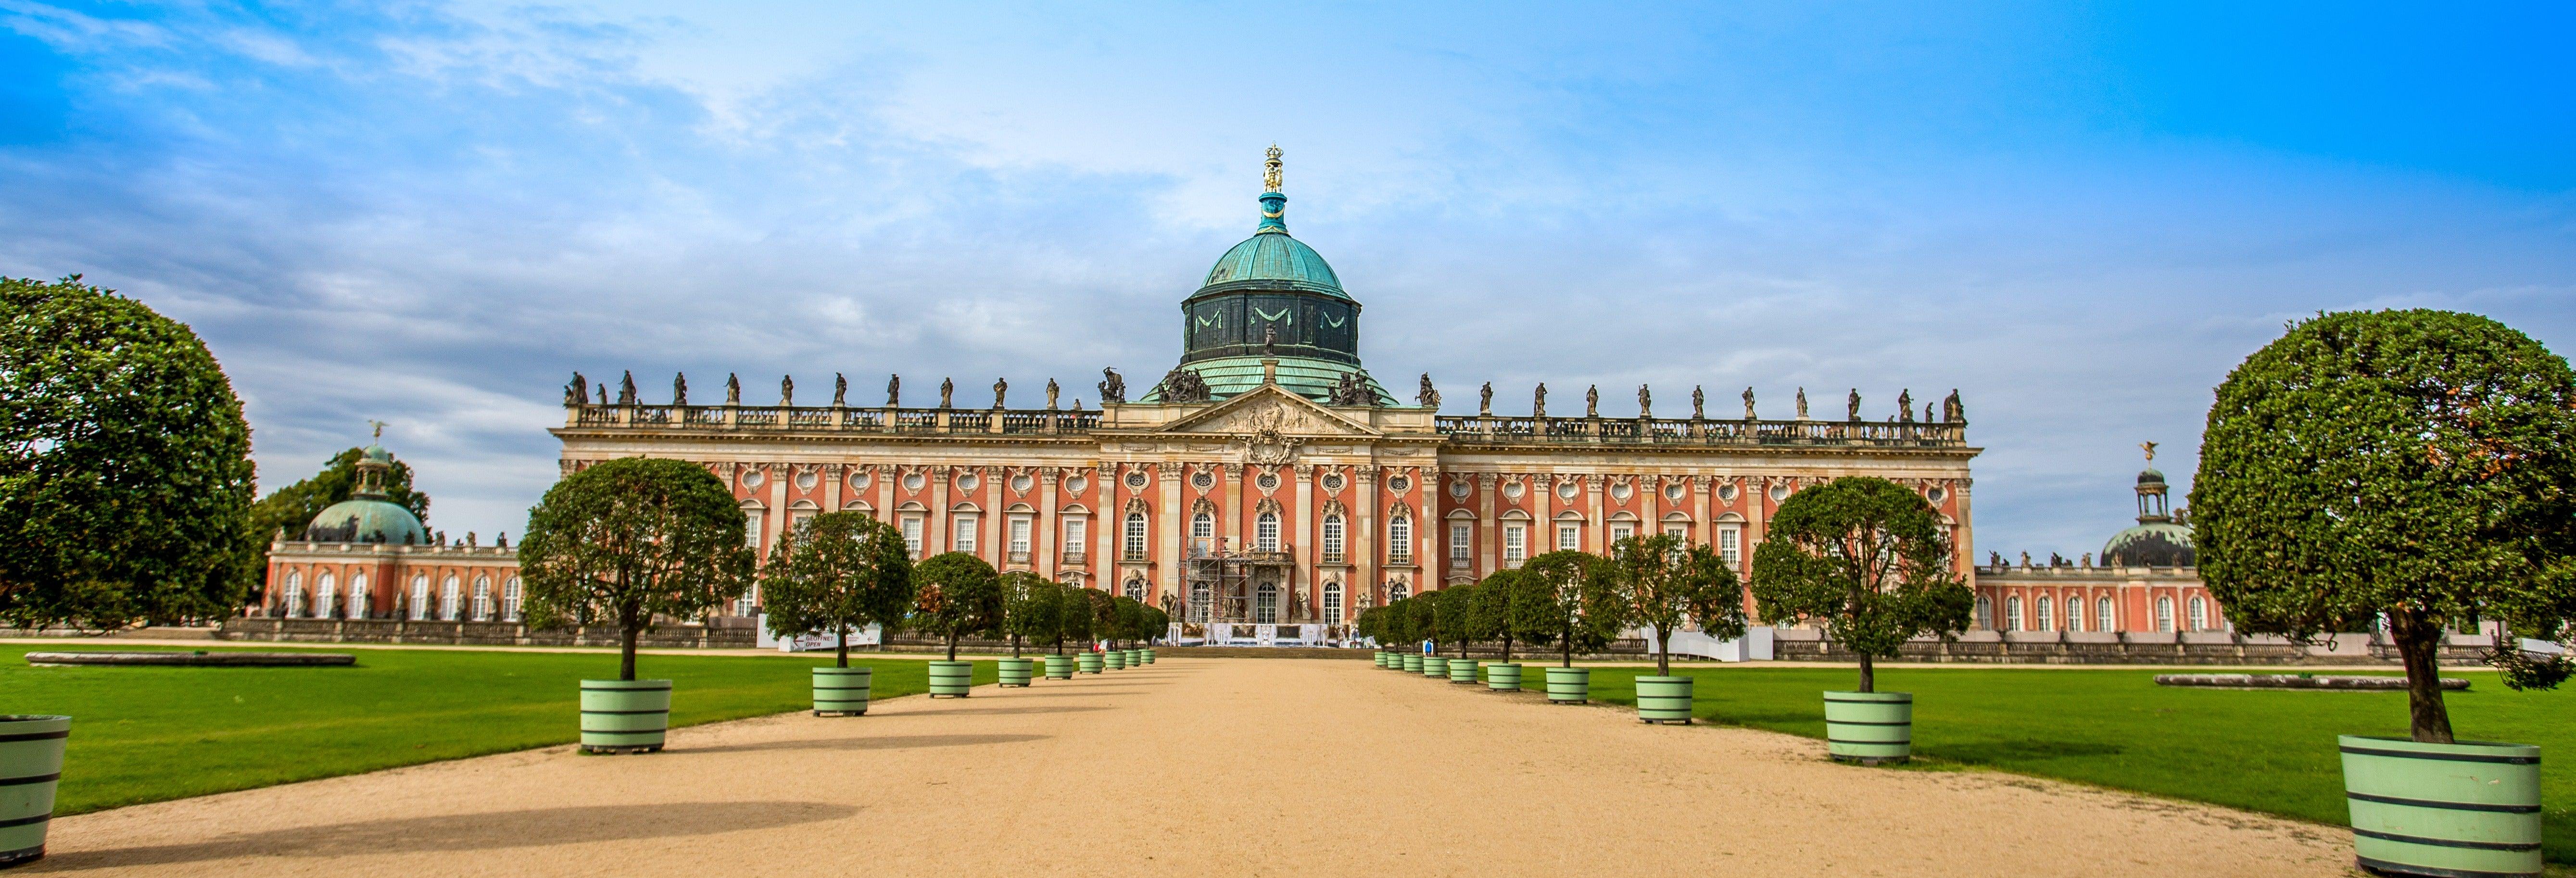 Excursión privada desde Berlín